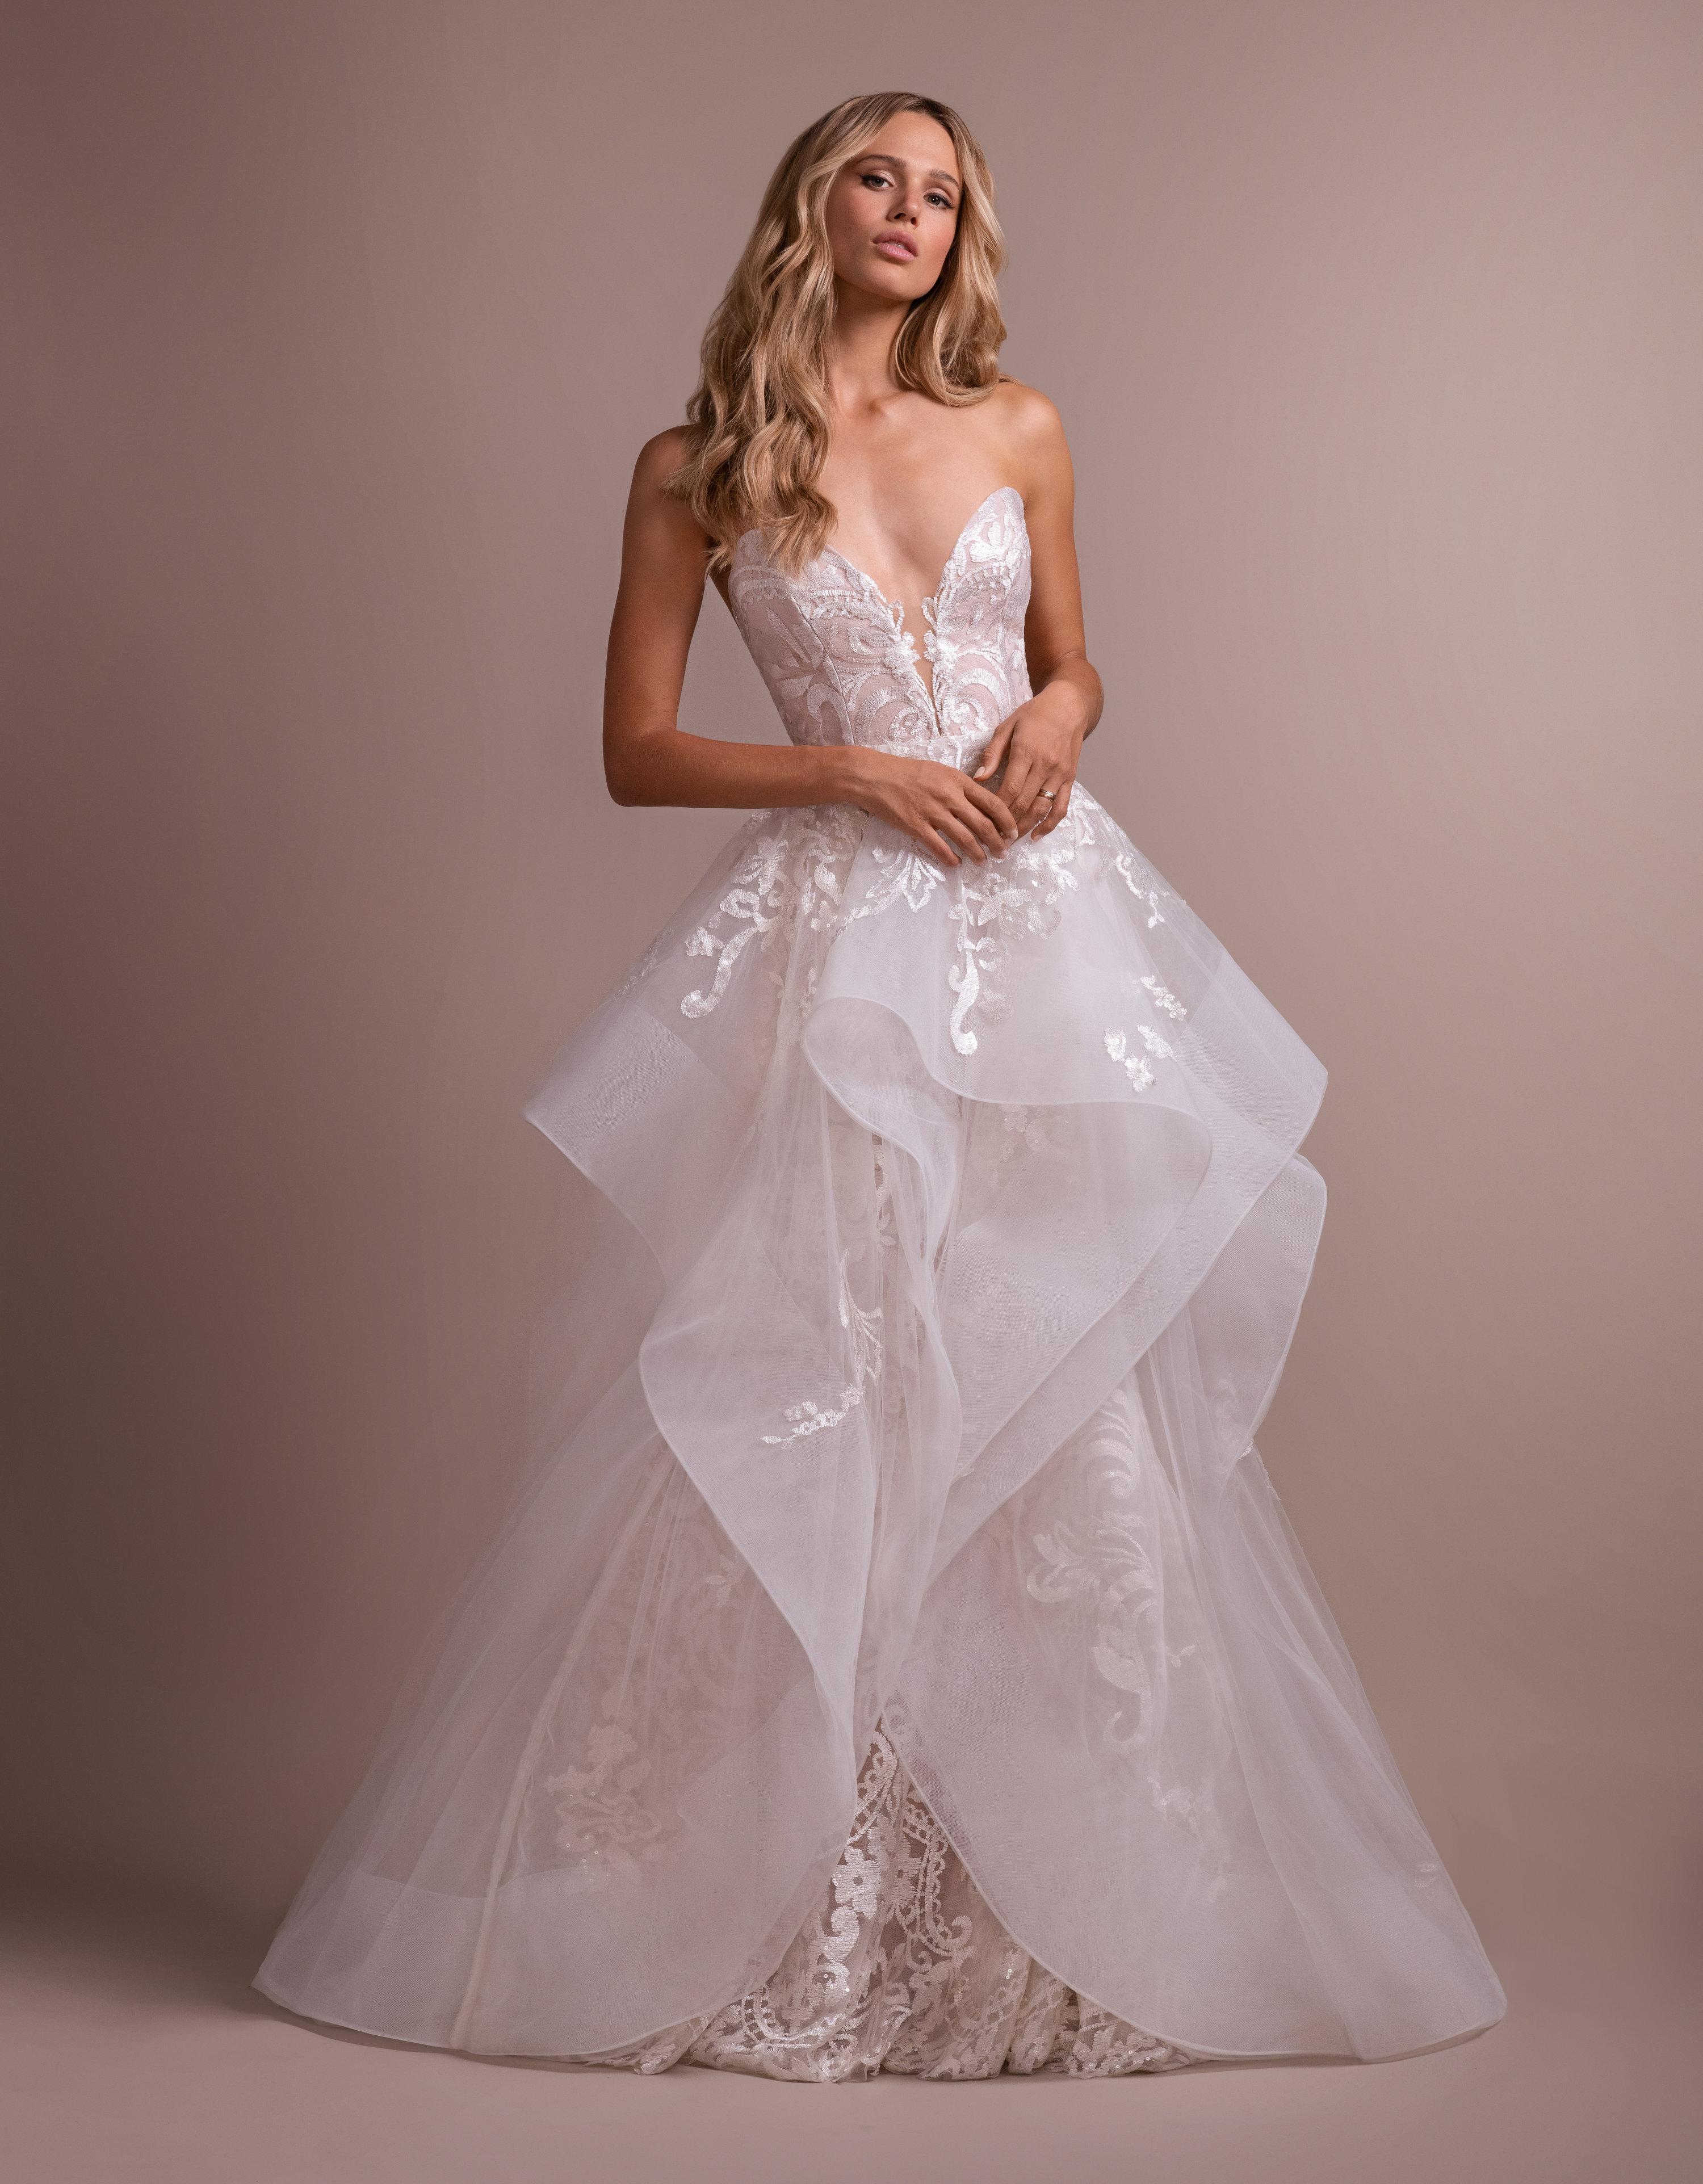 Bridal Gowns, Wedding Dresses by Hayley Paige Bridal - JLM